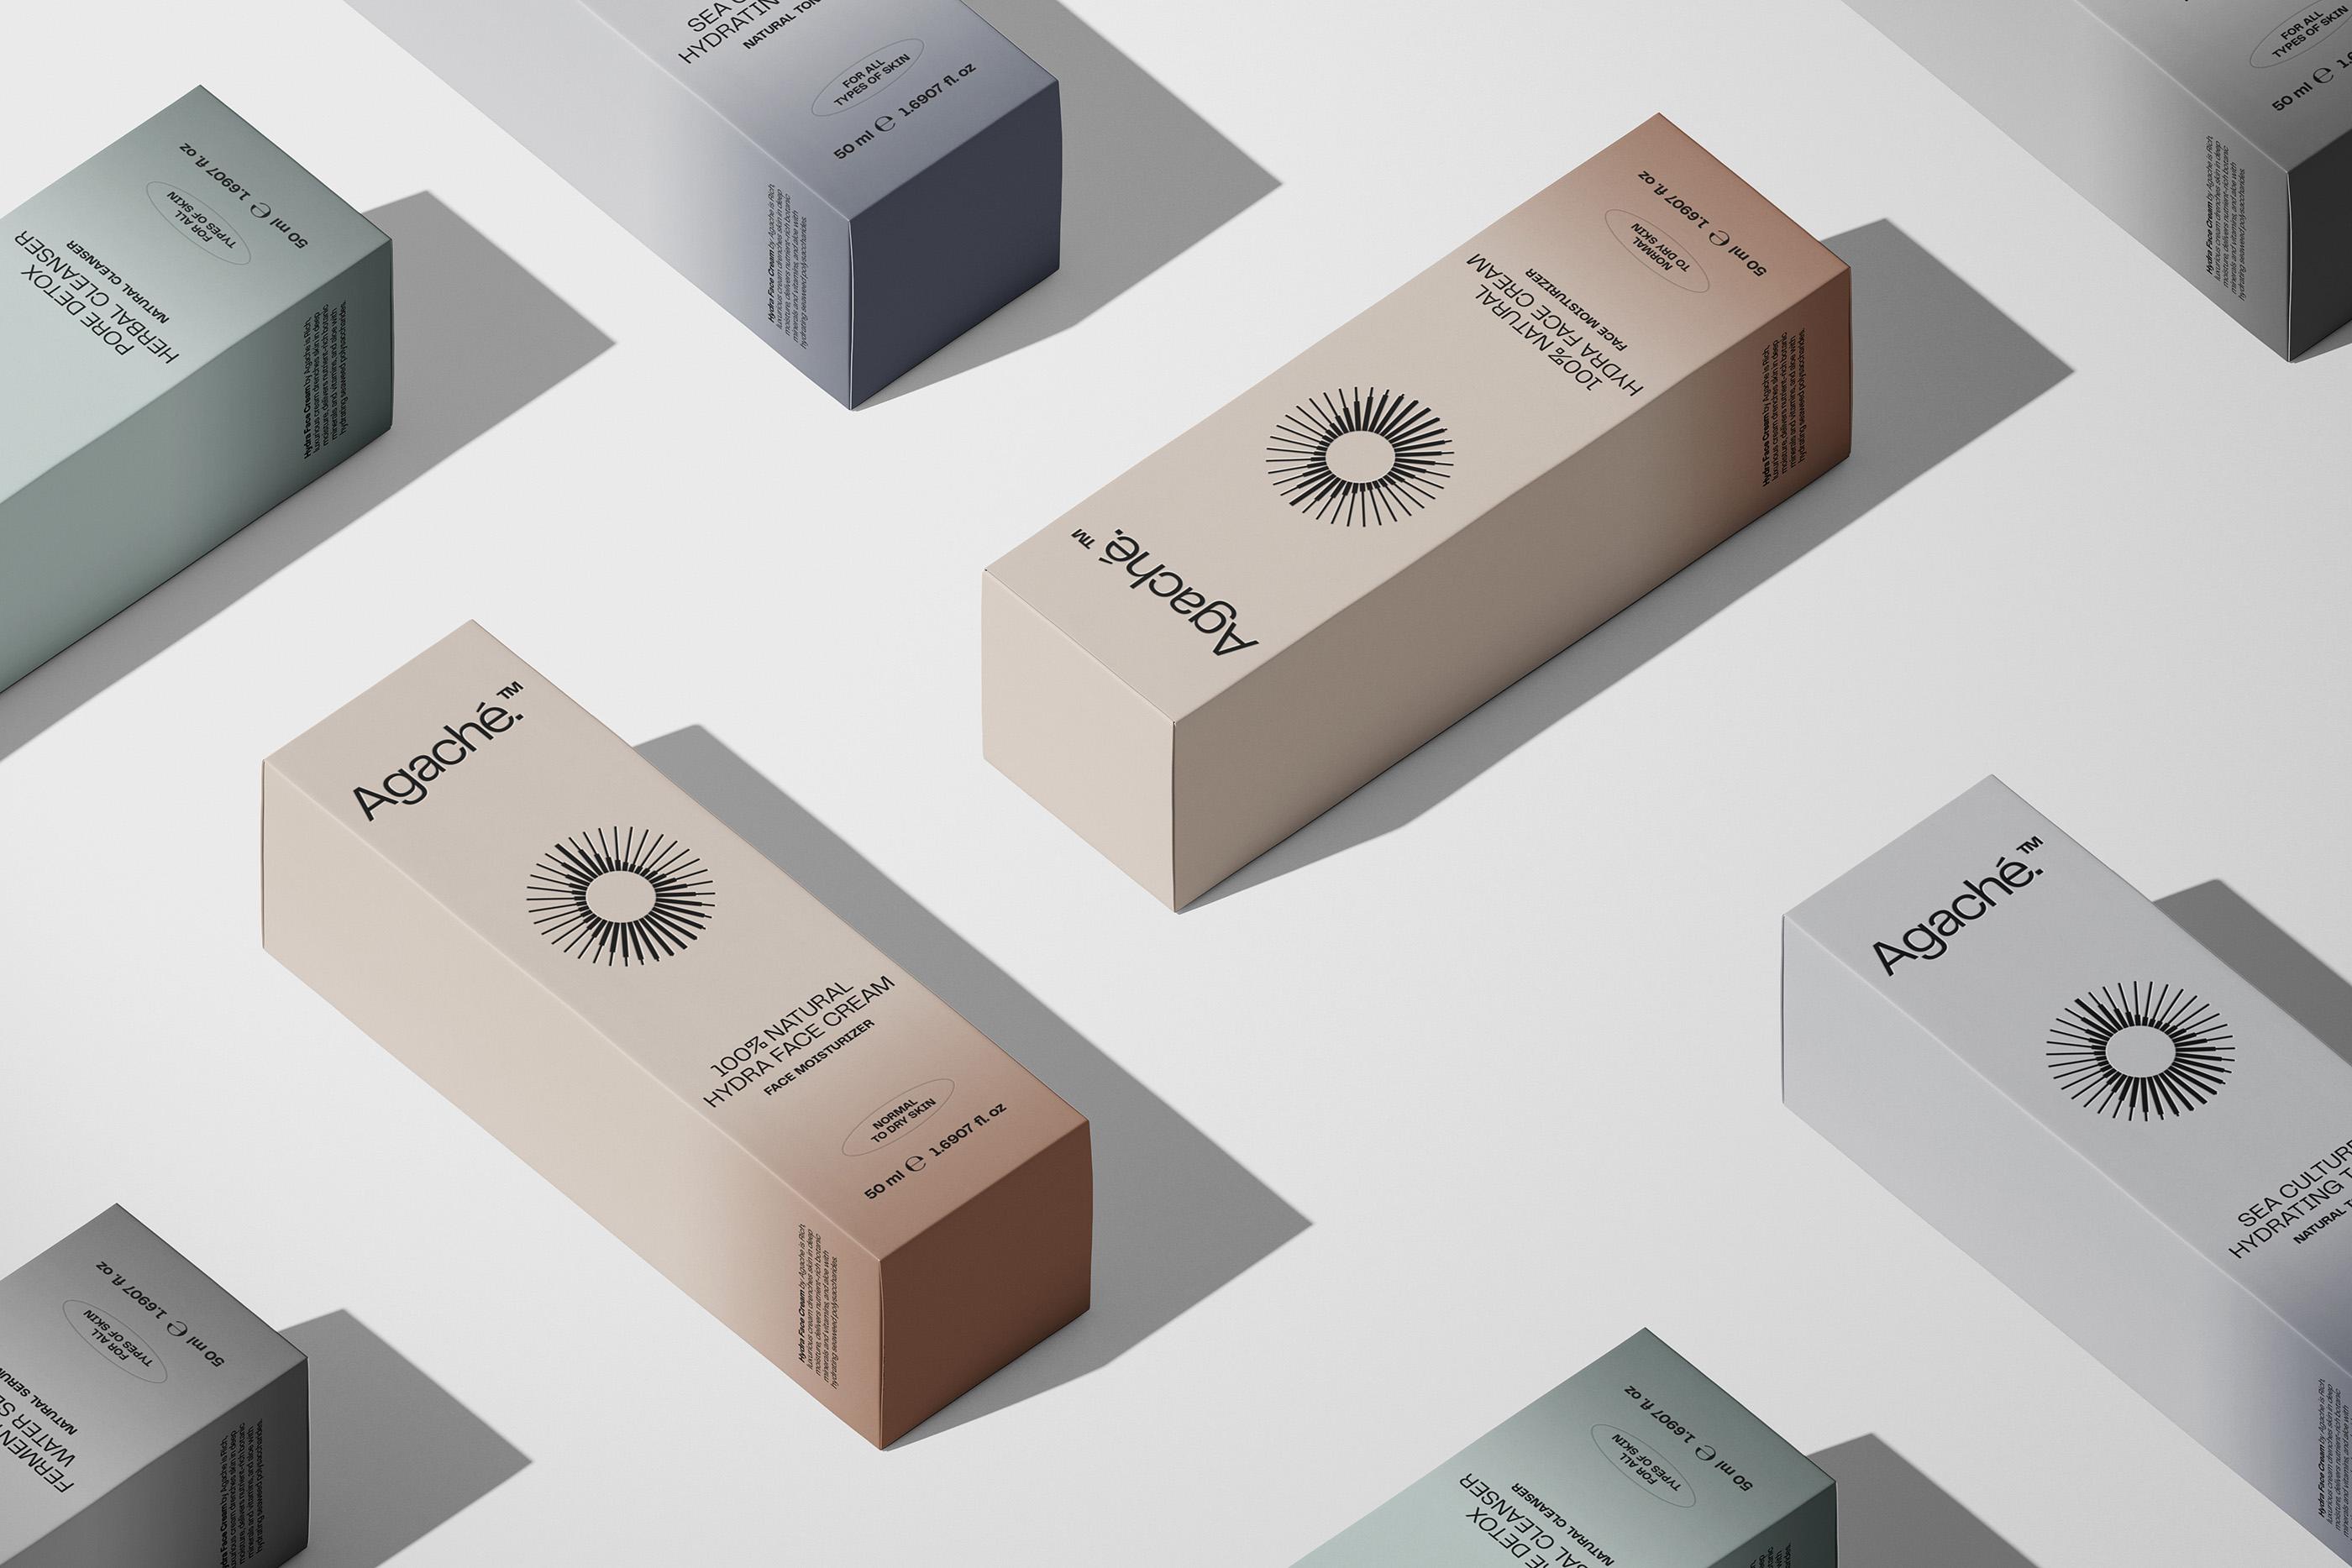 Alphamark Designs New Brand Identity System for Agache Skincare